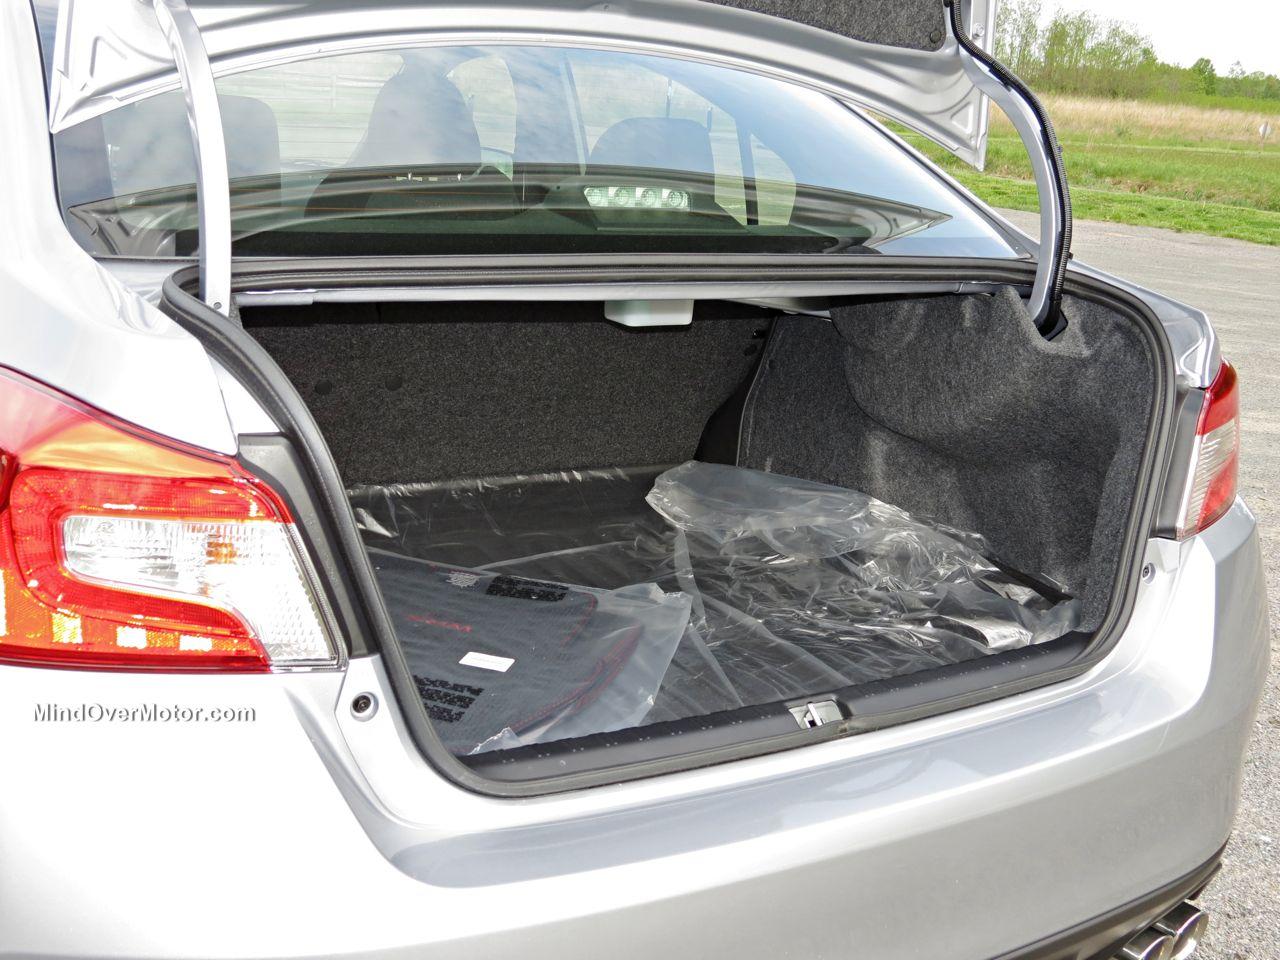 2015 Subaru WRX Trunk